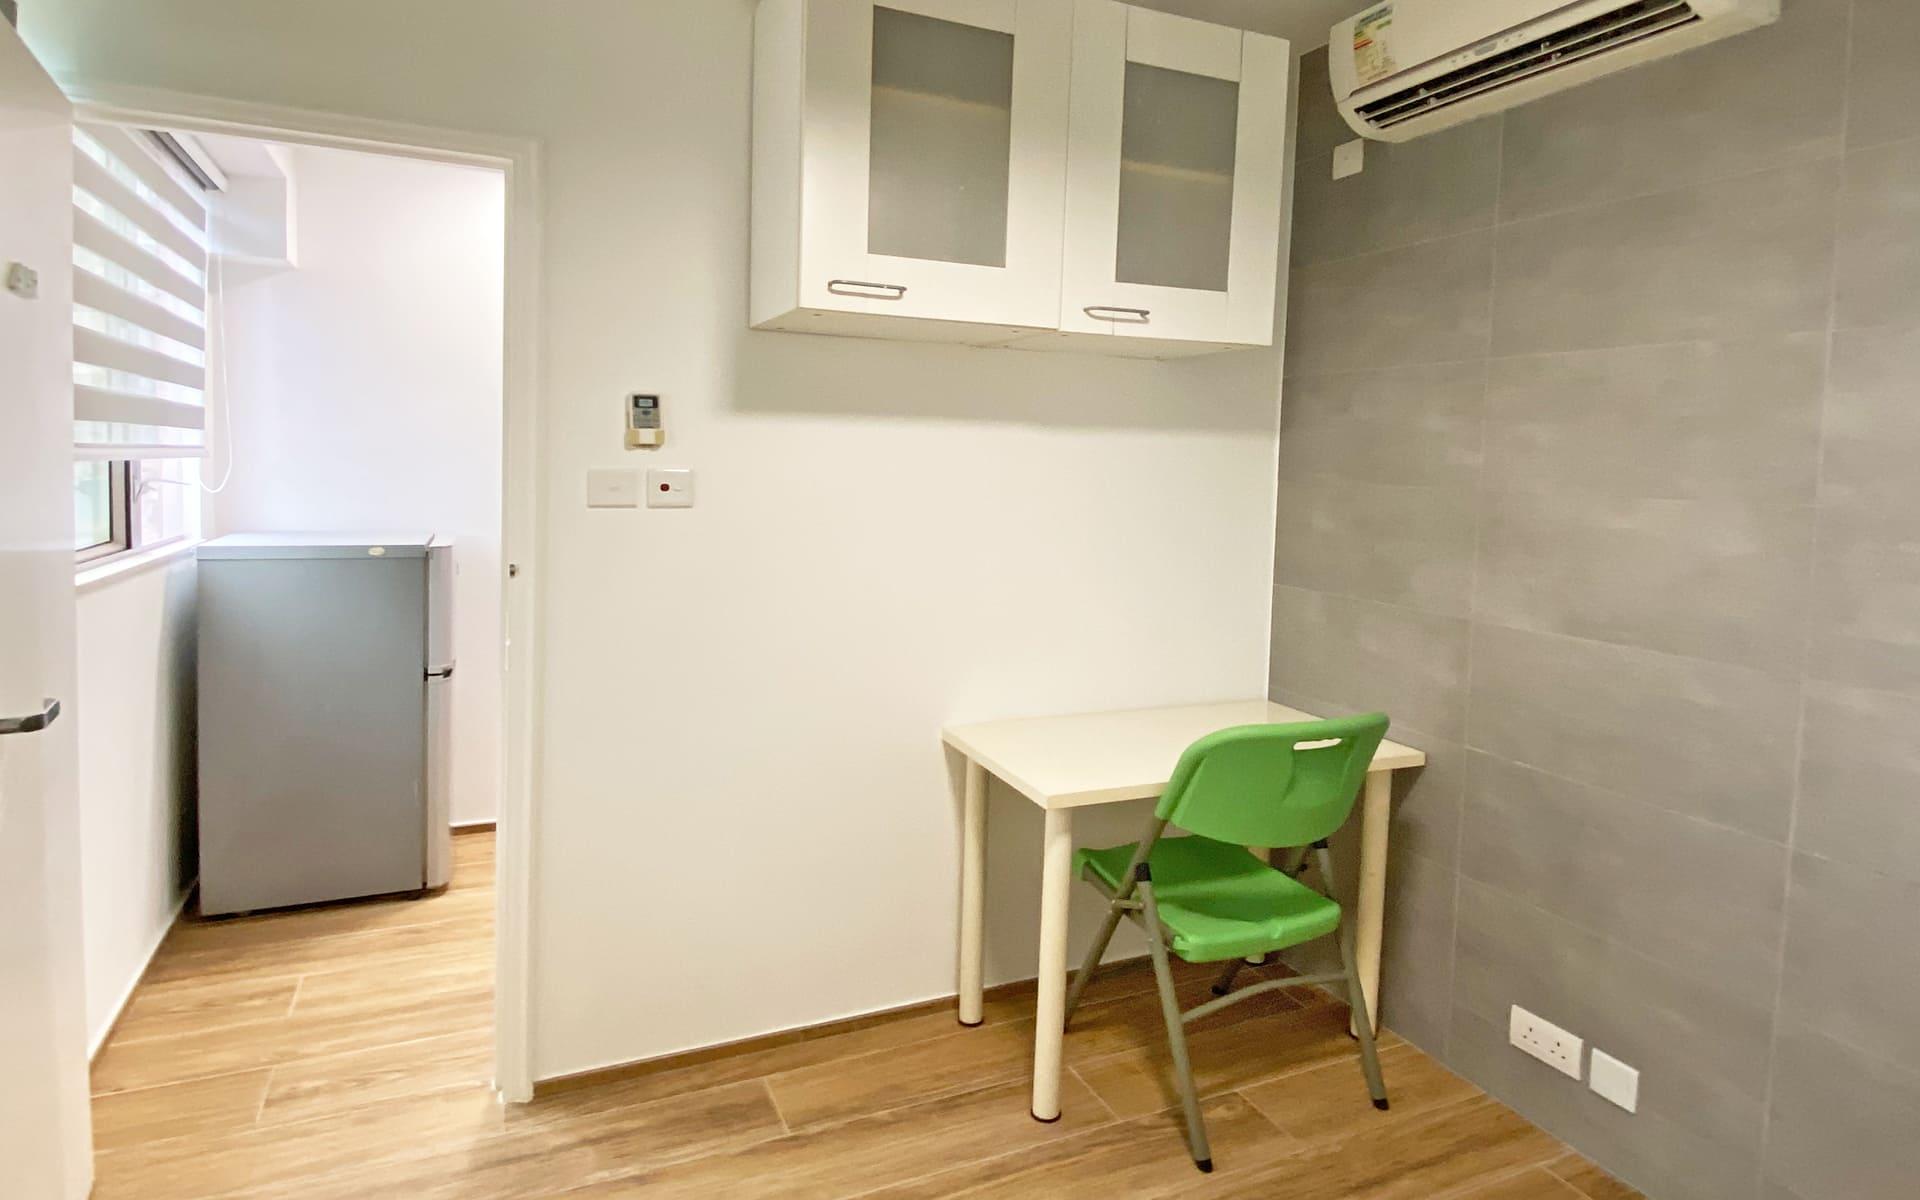 hk_service_apartment_15397116831593399938.jpg